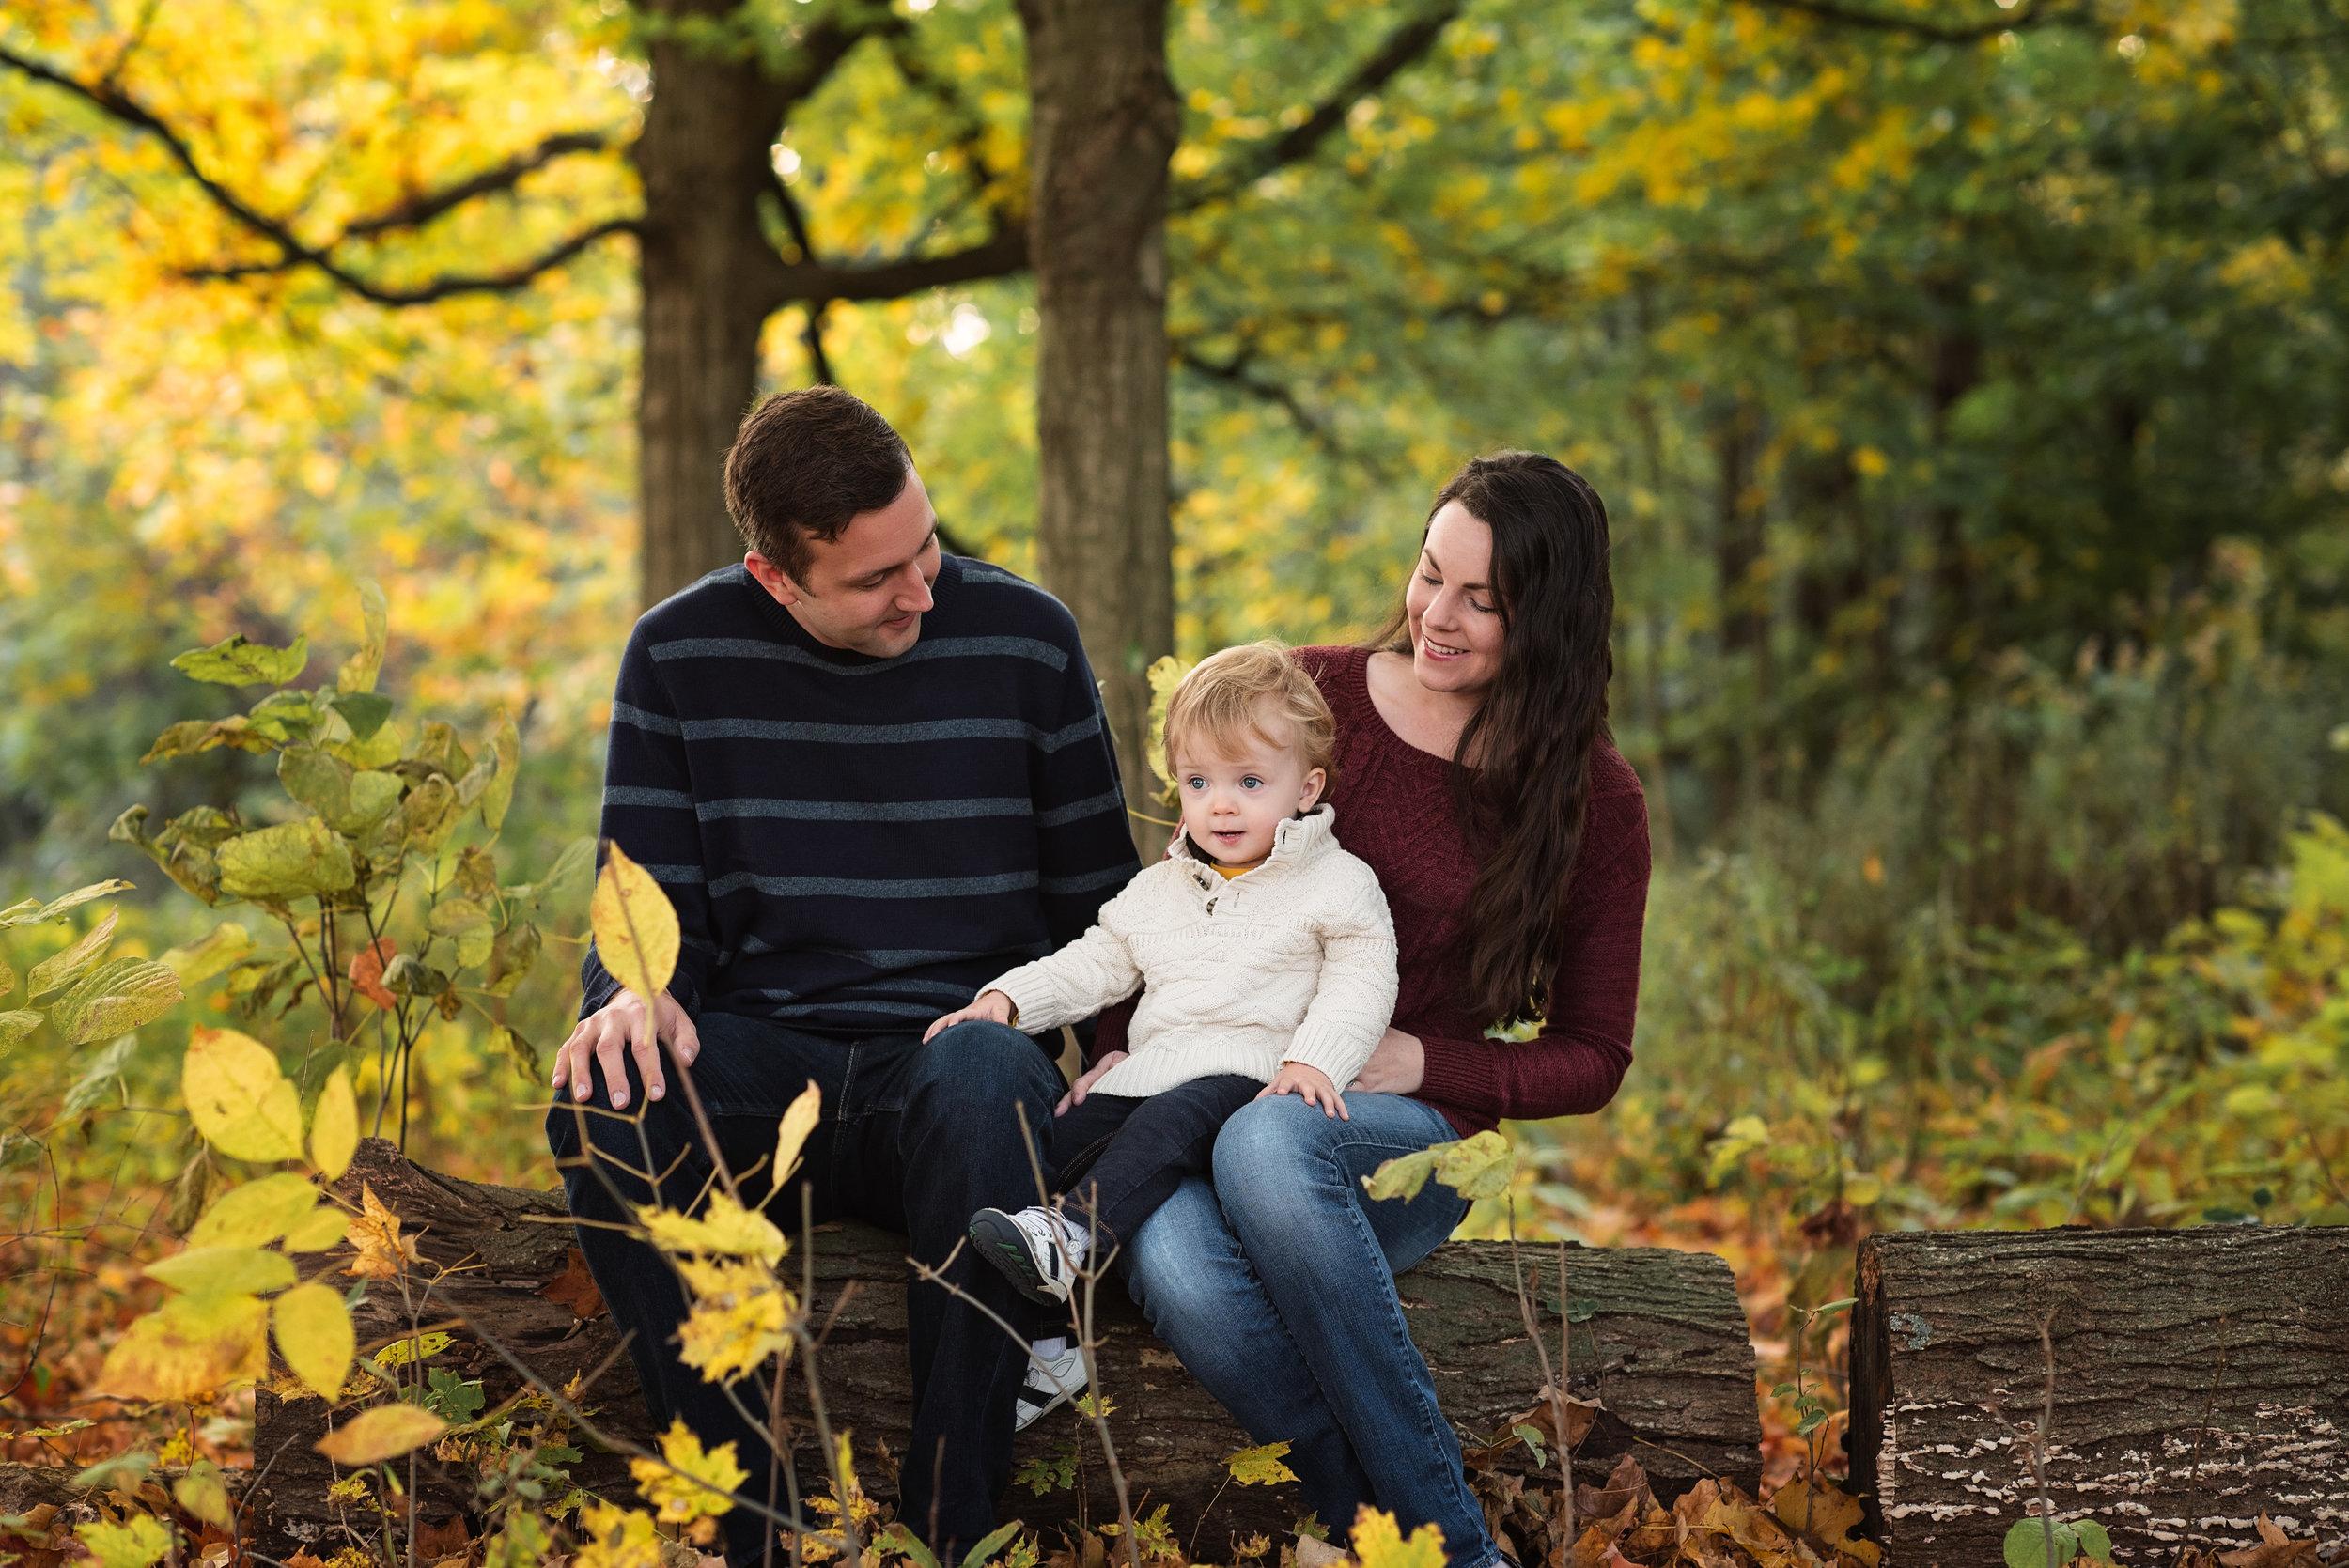 Family Photographer - Columbus Ohio - Erika Venci Photography